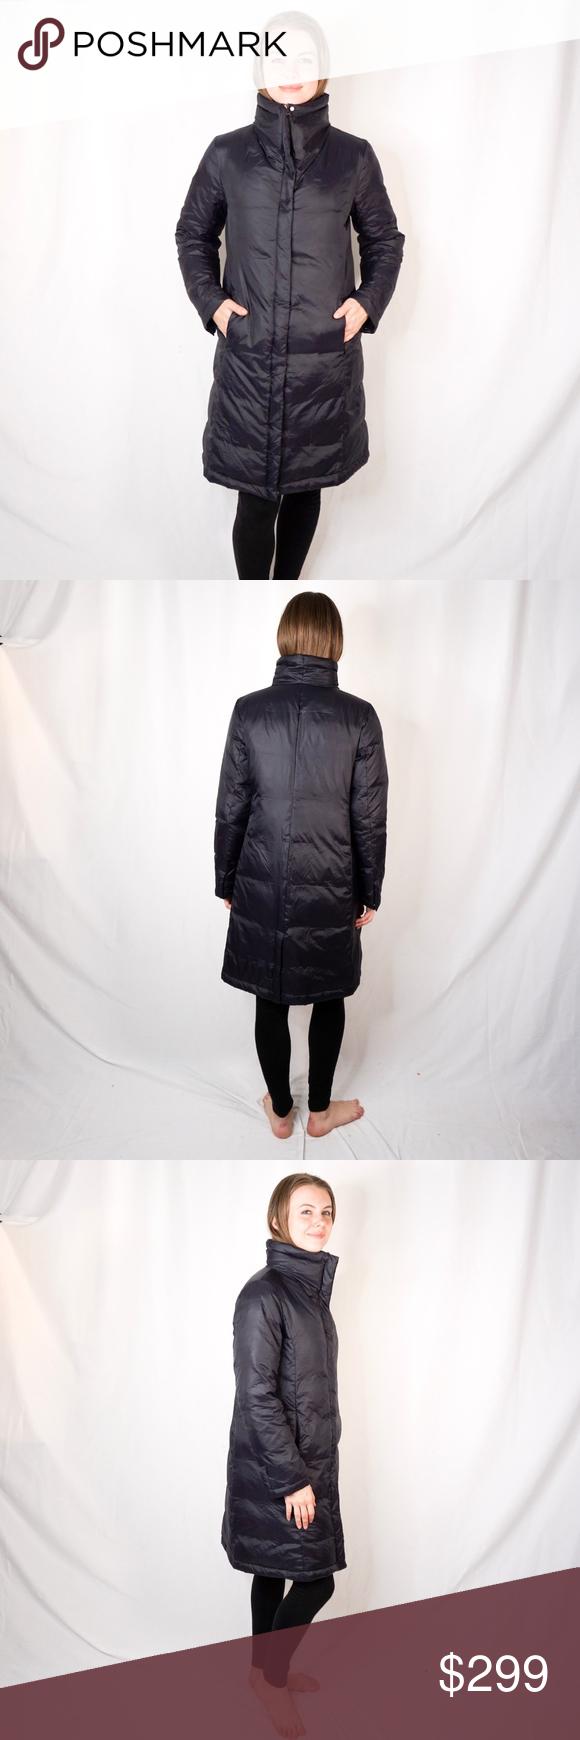 Eileen Fisher Black Long Down Puffer Jacket Reycle Long Black Puffer Coat Black Puffer Coat Eileen Fisher Jacket [ 1740 x 580 Pixel ]